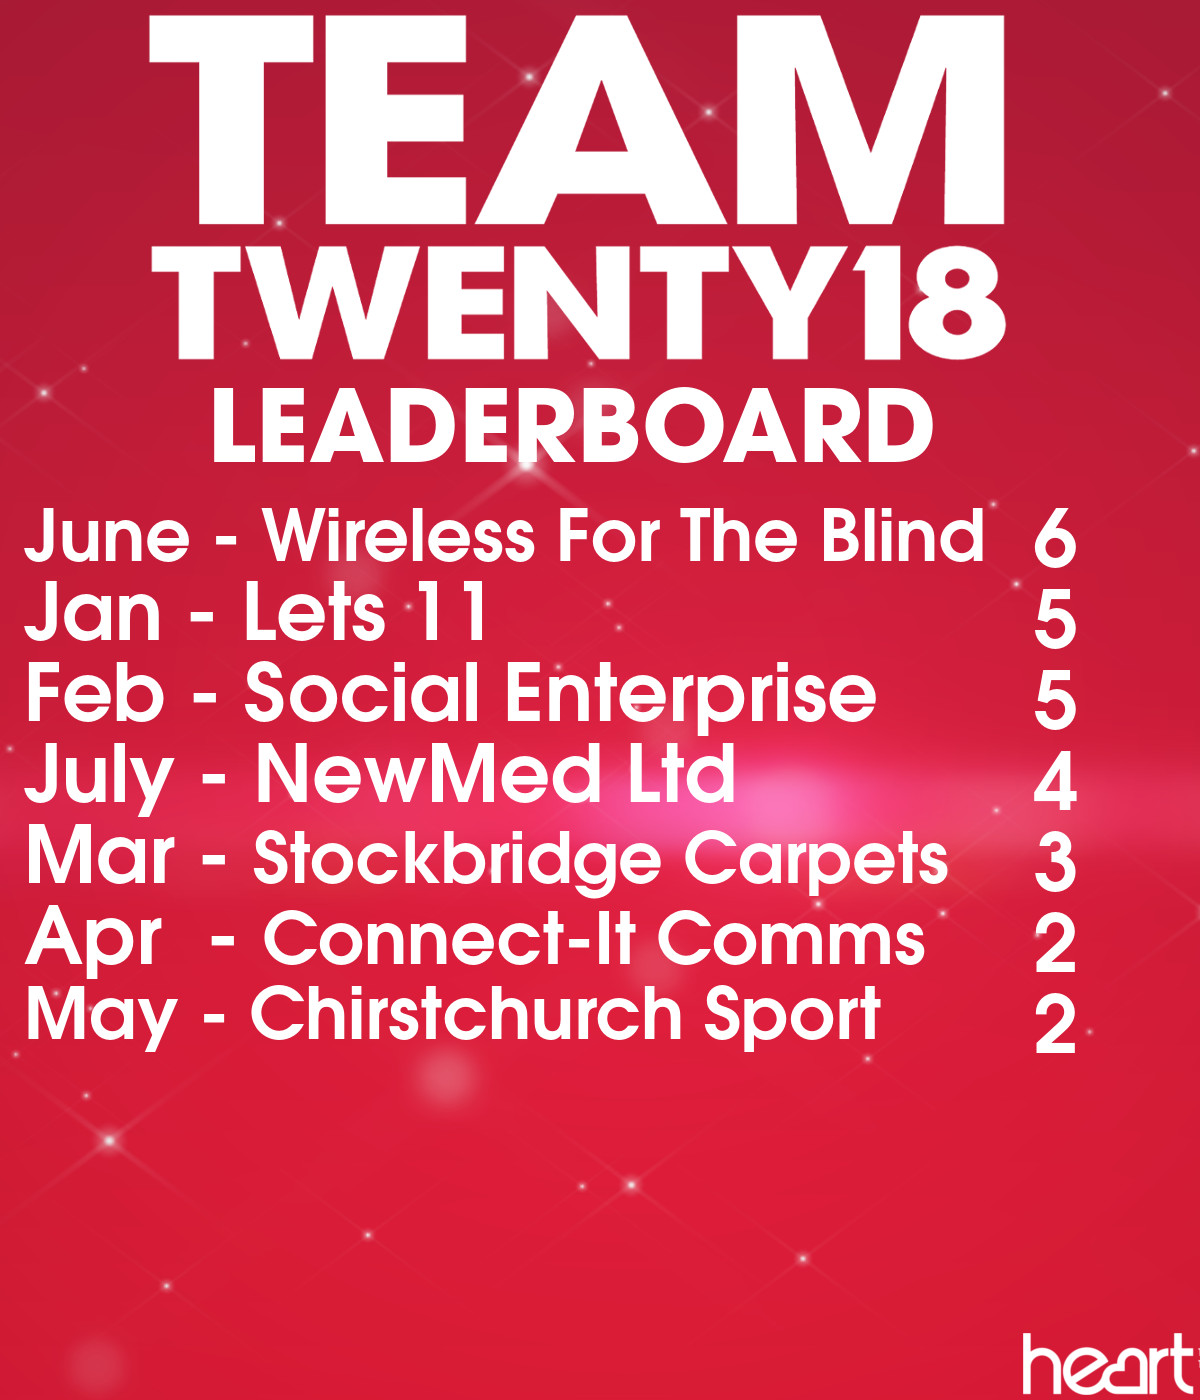 Team 2018 July